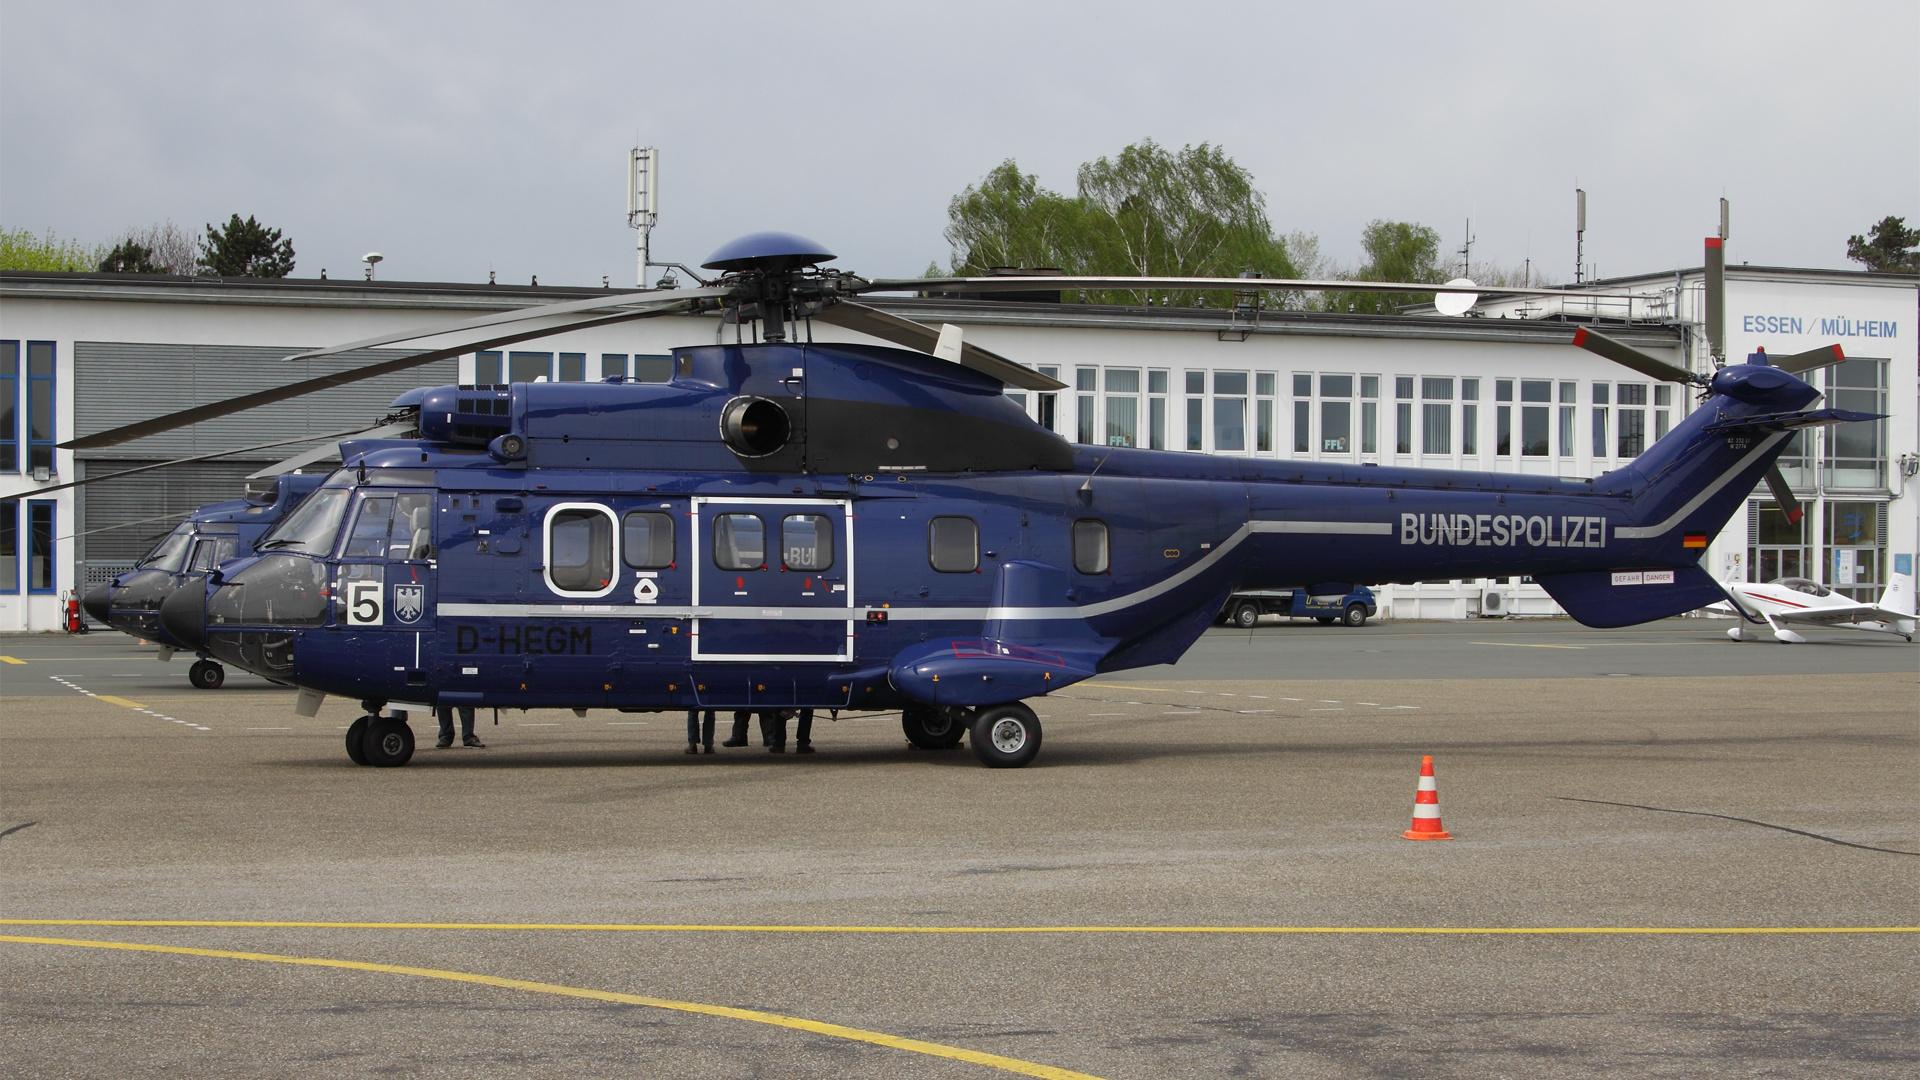 D-HEGM-1 AS332 ESS 201204